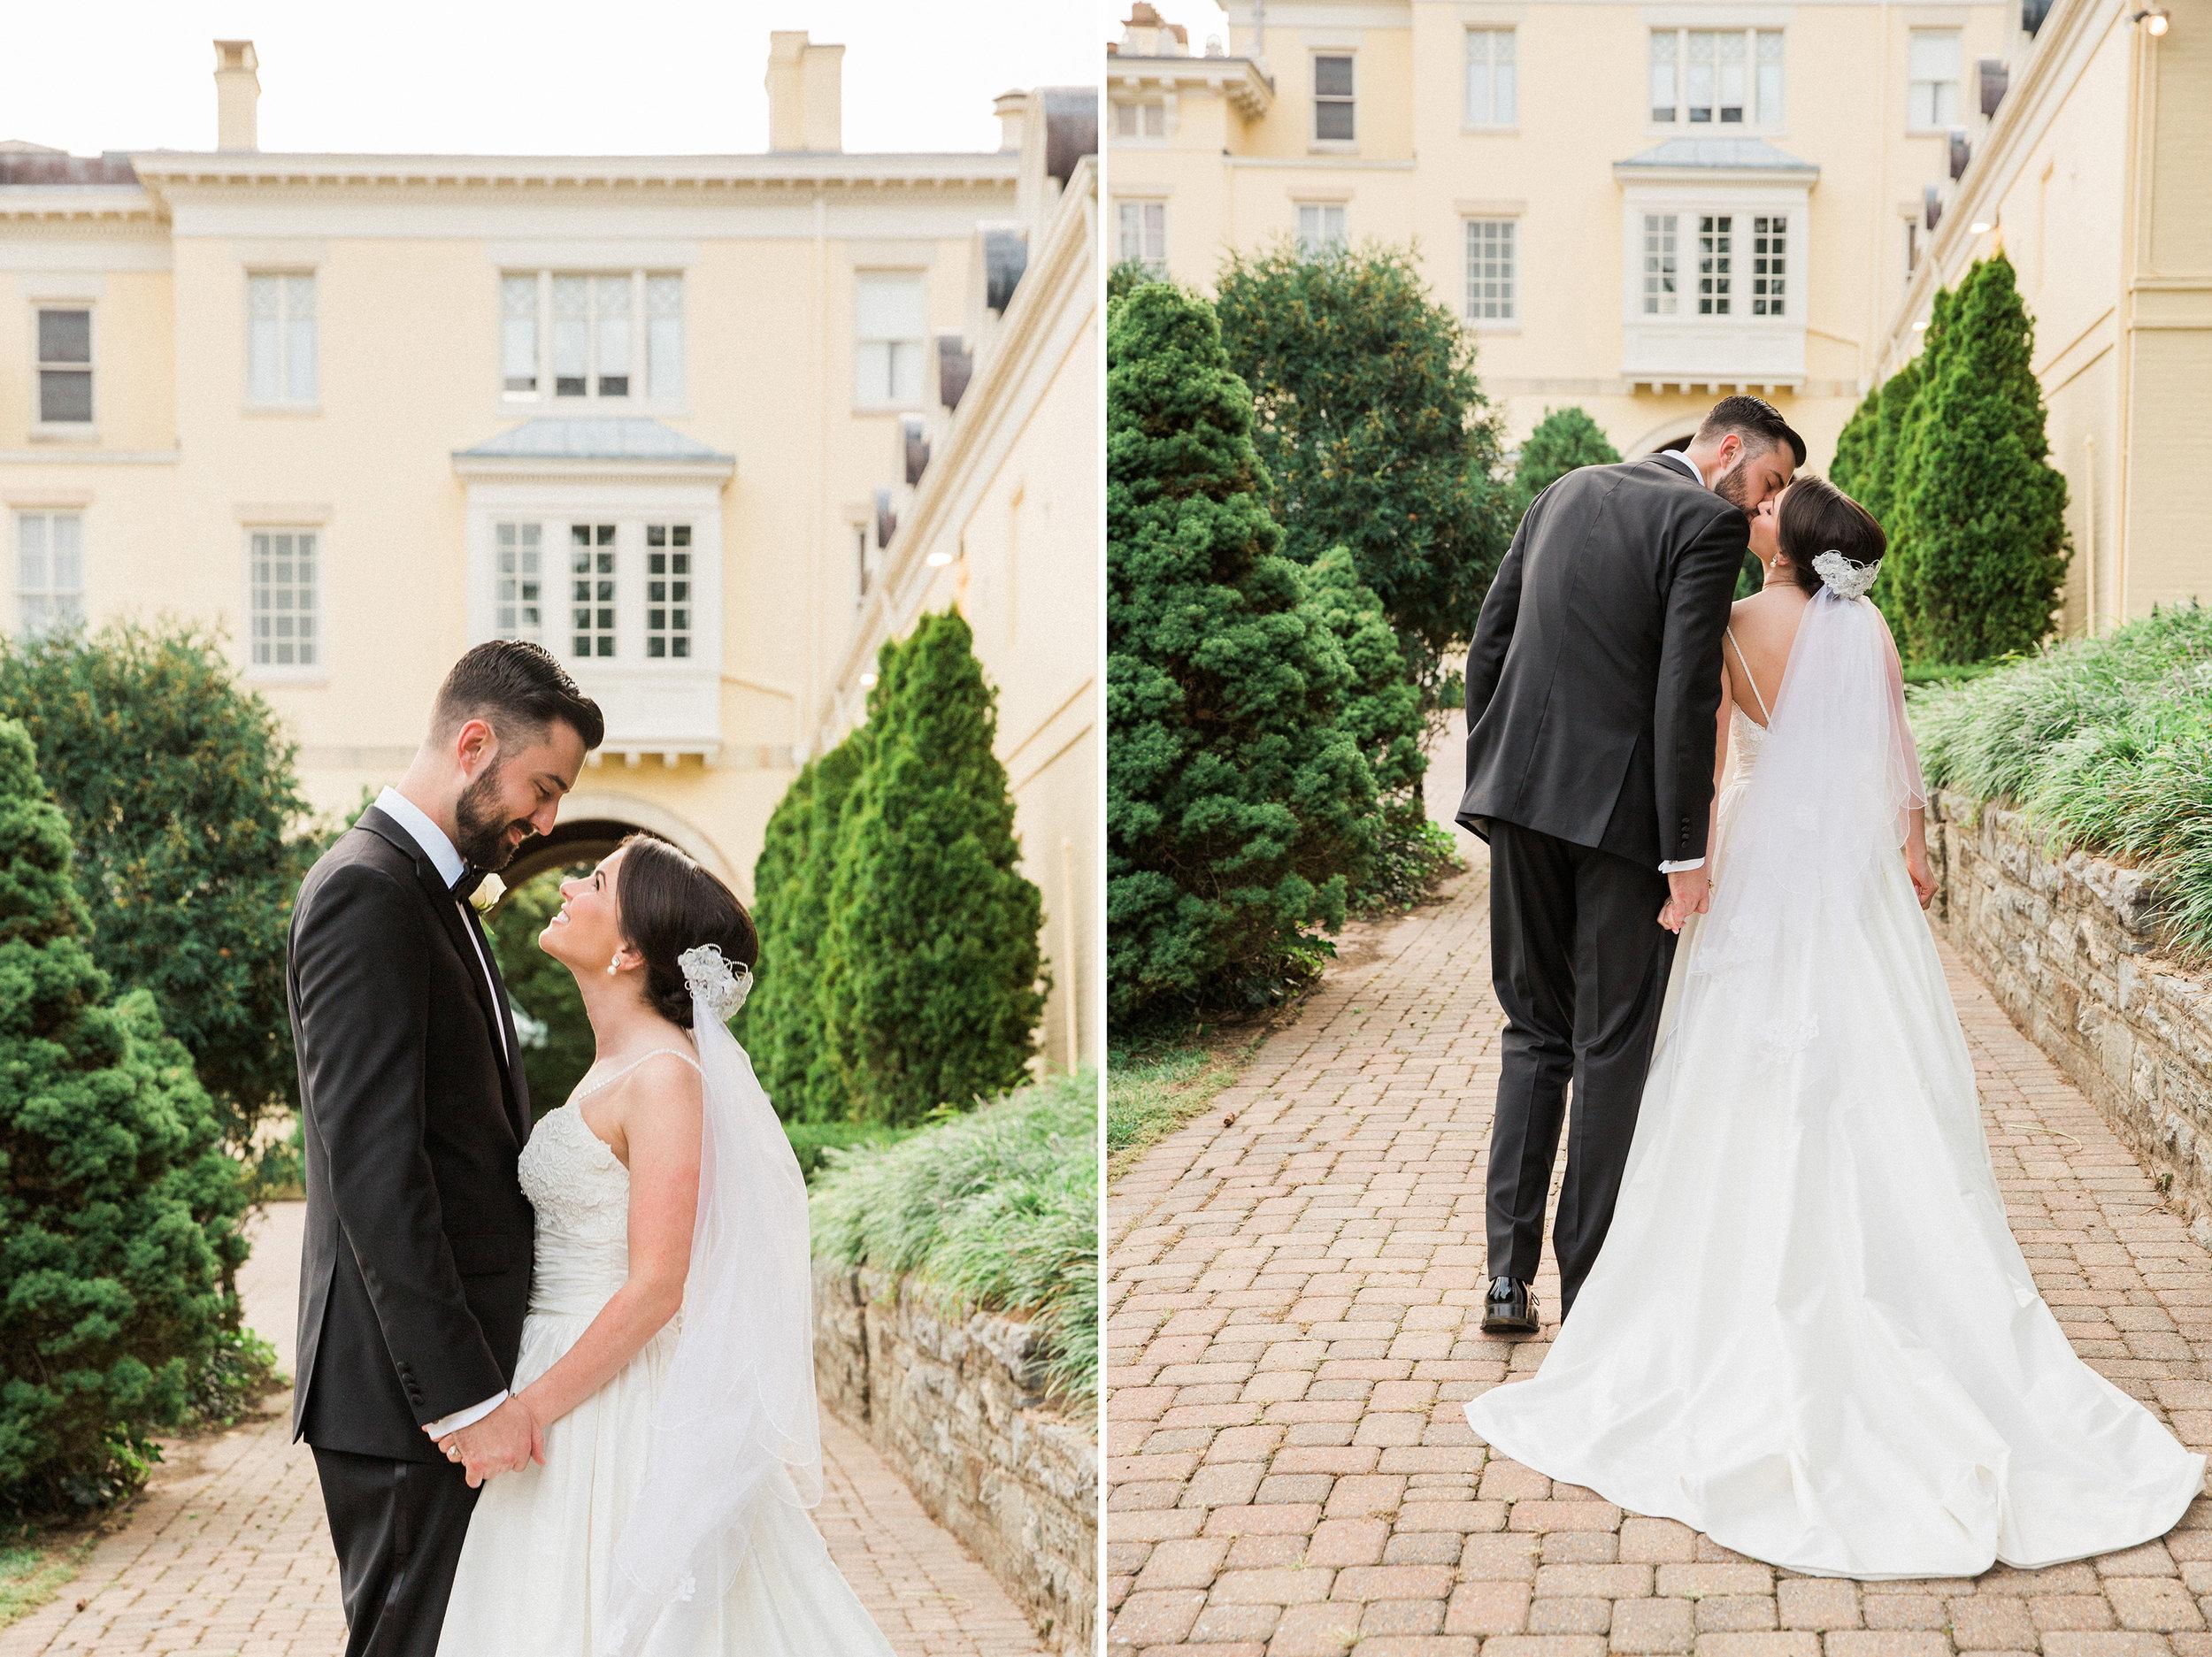 Evergreen-Museum-Balitmore-Maryland-Wedding-Black-Tie-Bride-035.jpg